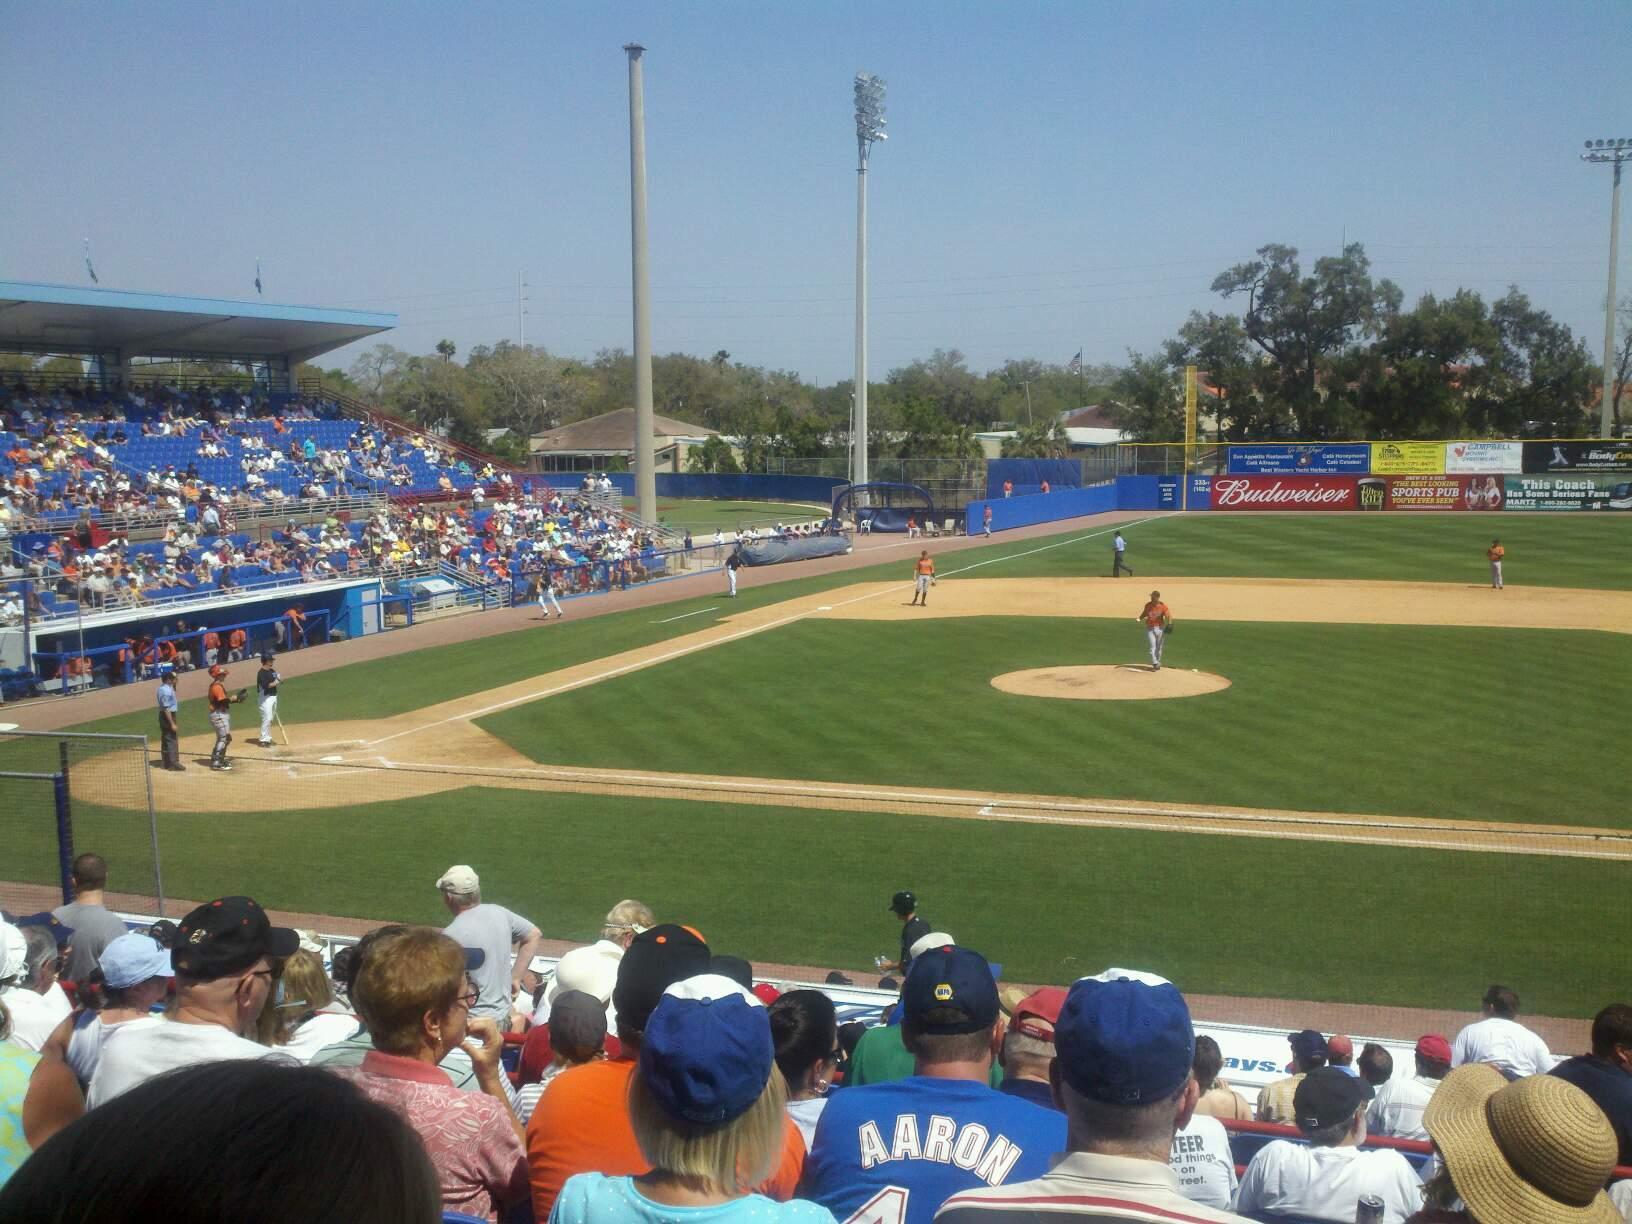 Florida Auto Exchange Stadium section 203 row 9 seat 4